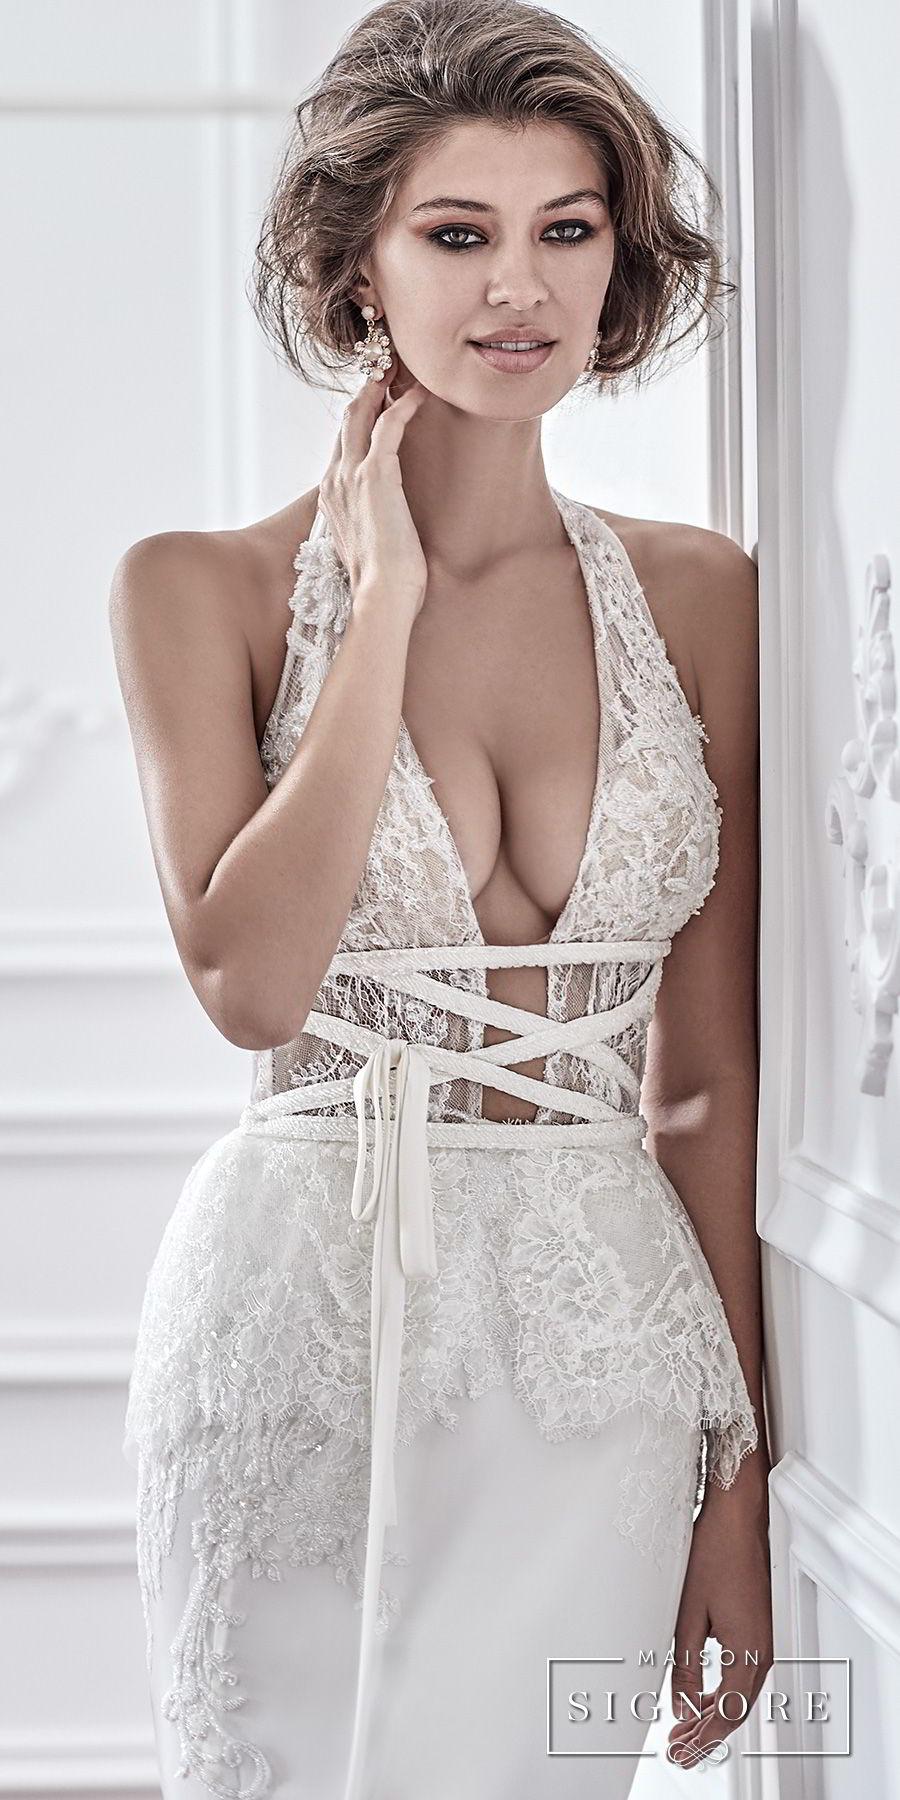 maison signore 2017 bridal sleeveless halter neck deep plunging v neck heavily embellished bodice elegant sexy fit and flare sheath wedding dress medium train (dafne) zv